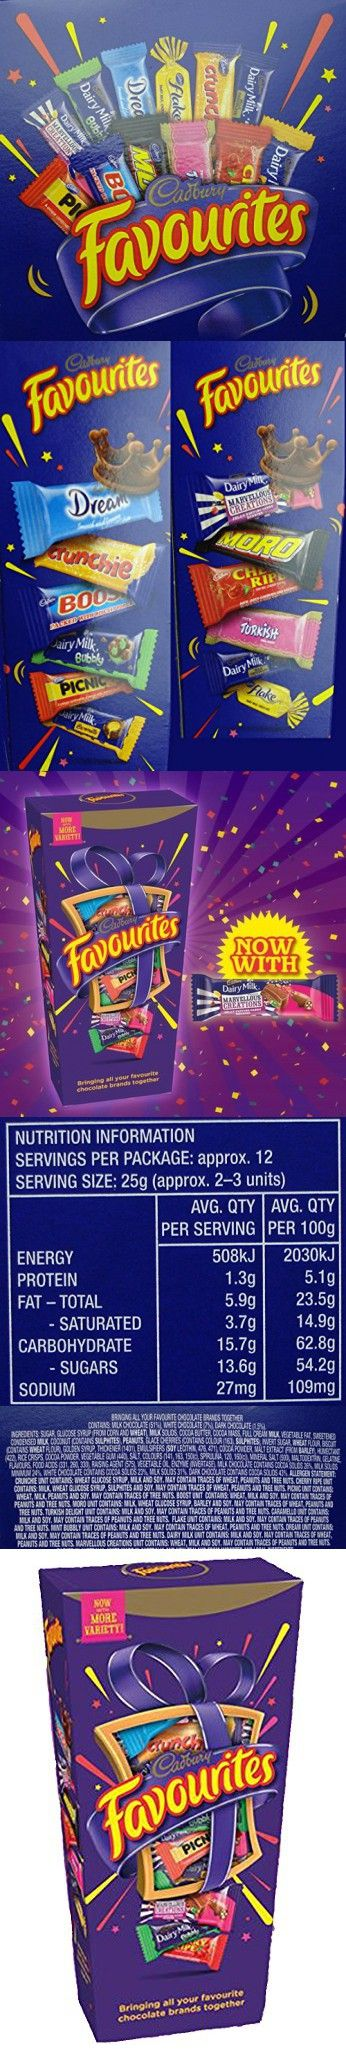 Cadbury Favourites Chocolate Variety 320gm (11.3oz) Gift Box - Dream, Crunchie, Boost, Dairy Milk, Picnic, Caramello, Marvelous Creations, Moro, Cherry Ripe, Turkish Delight, Flake